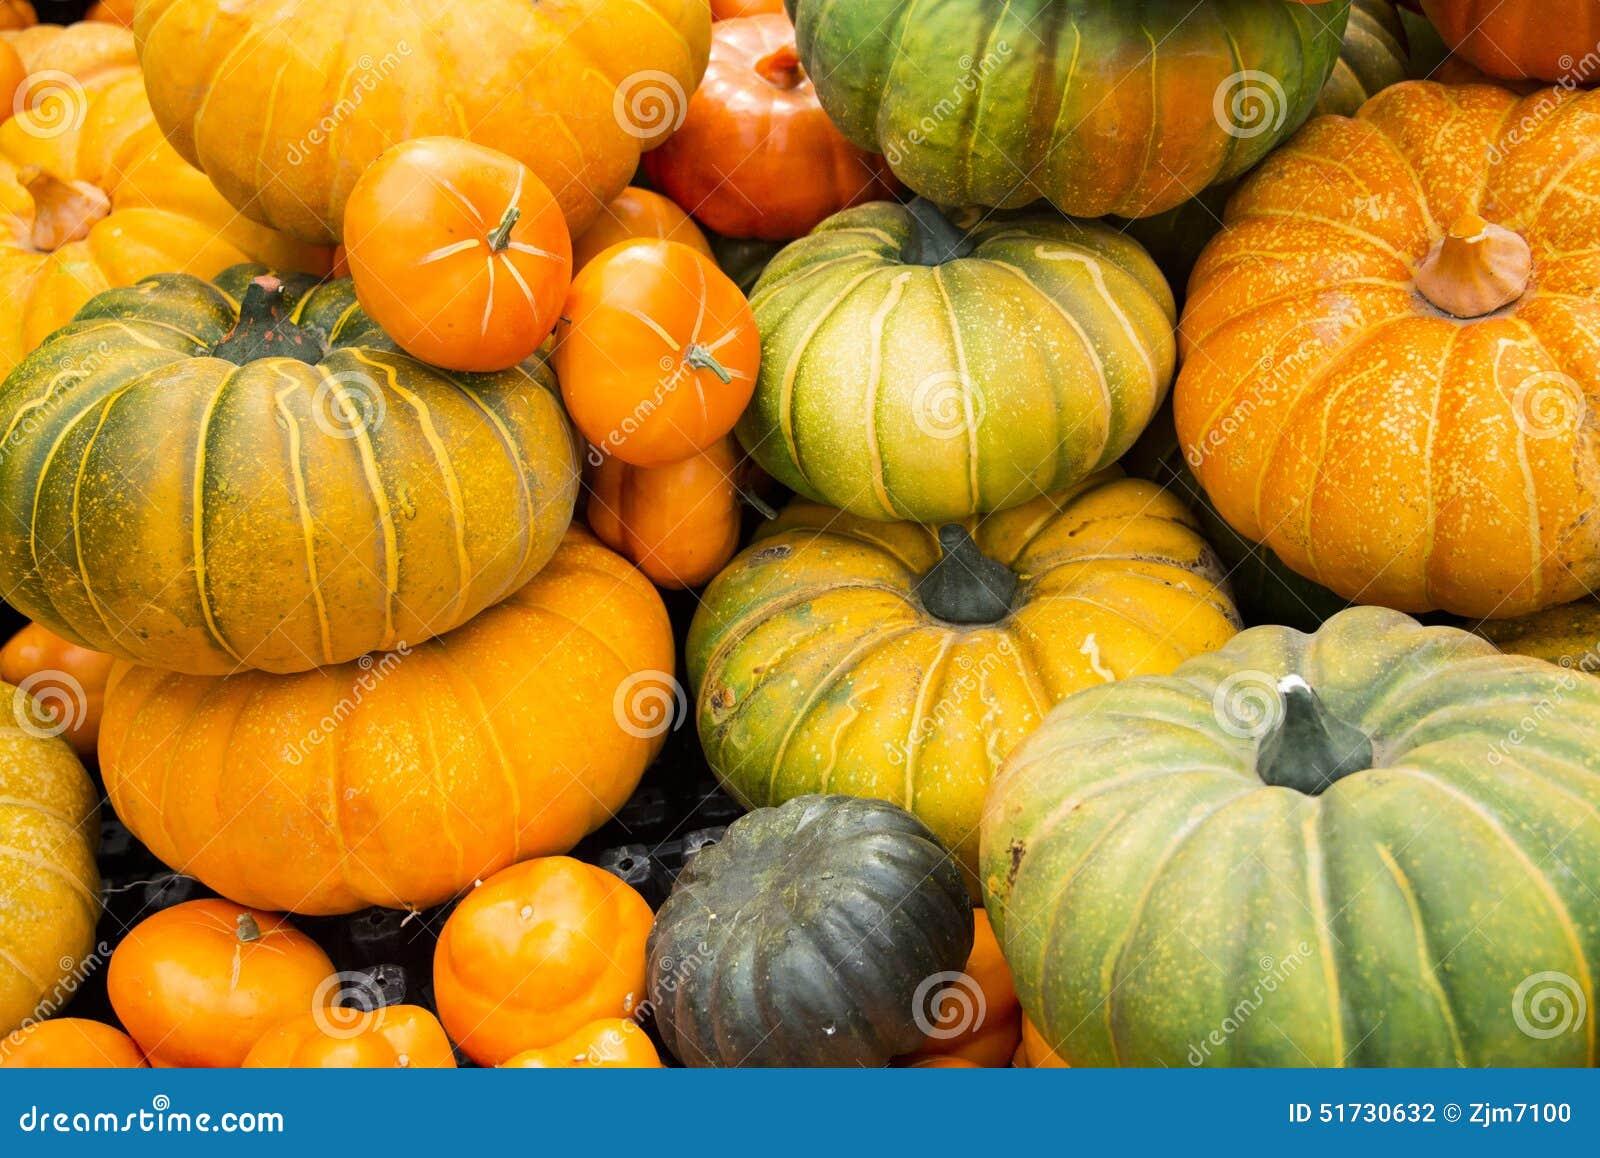 Food, pumpkin